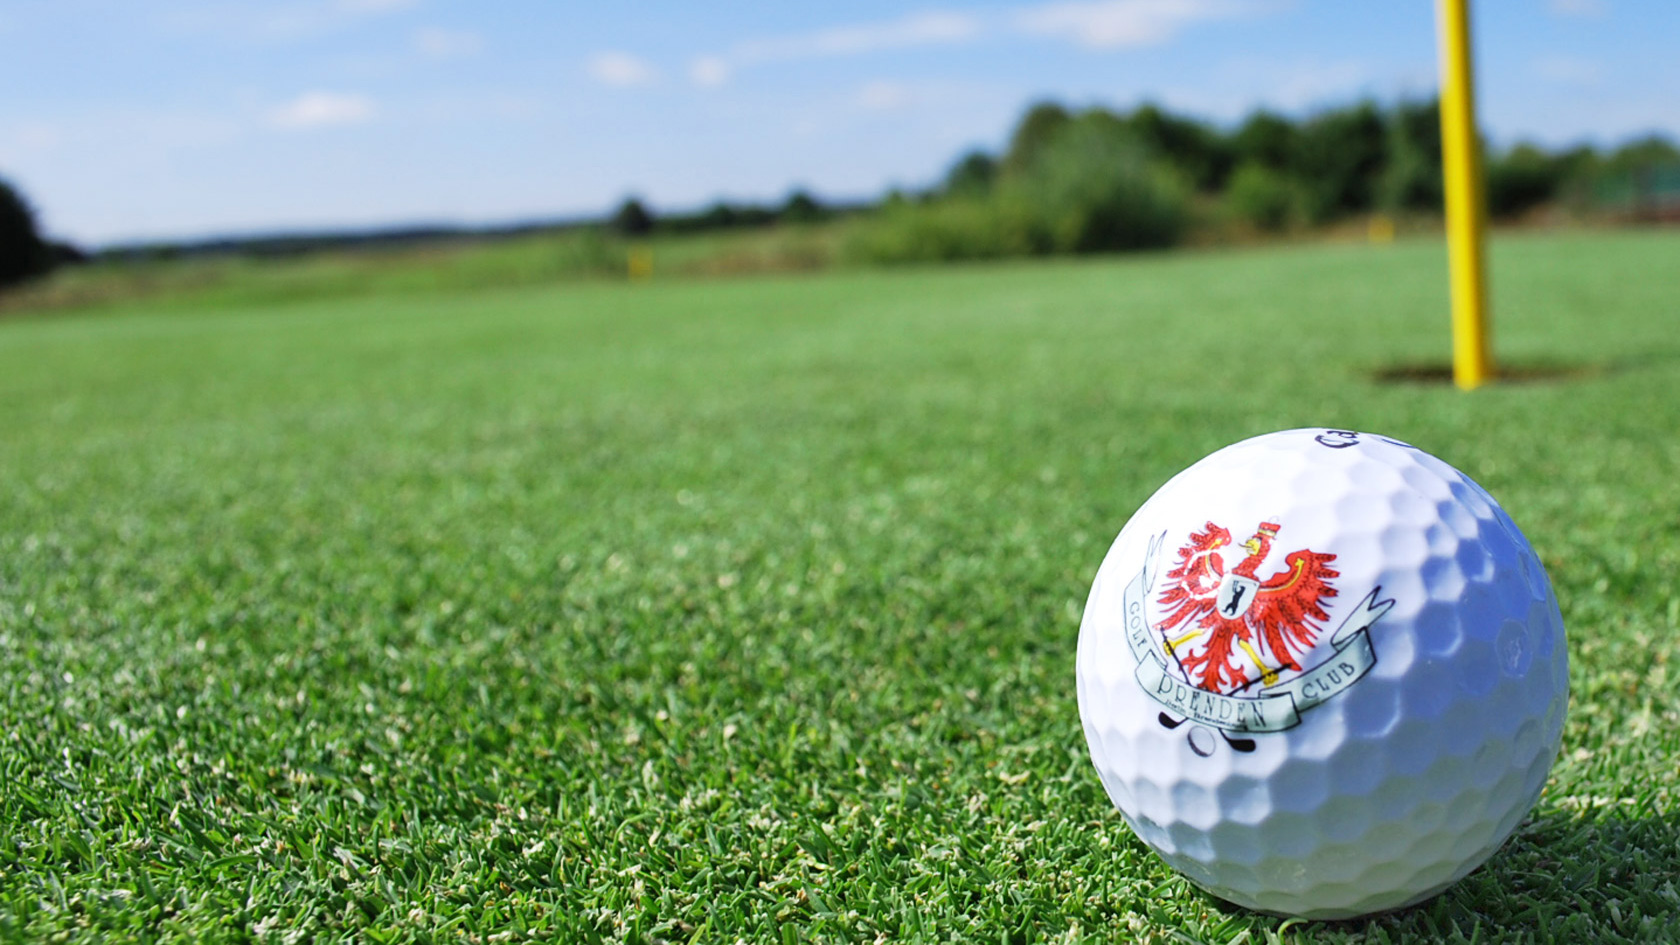 golfclubberlingolfballnew2.jpg